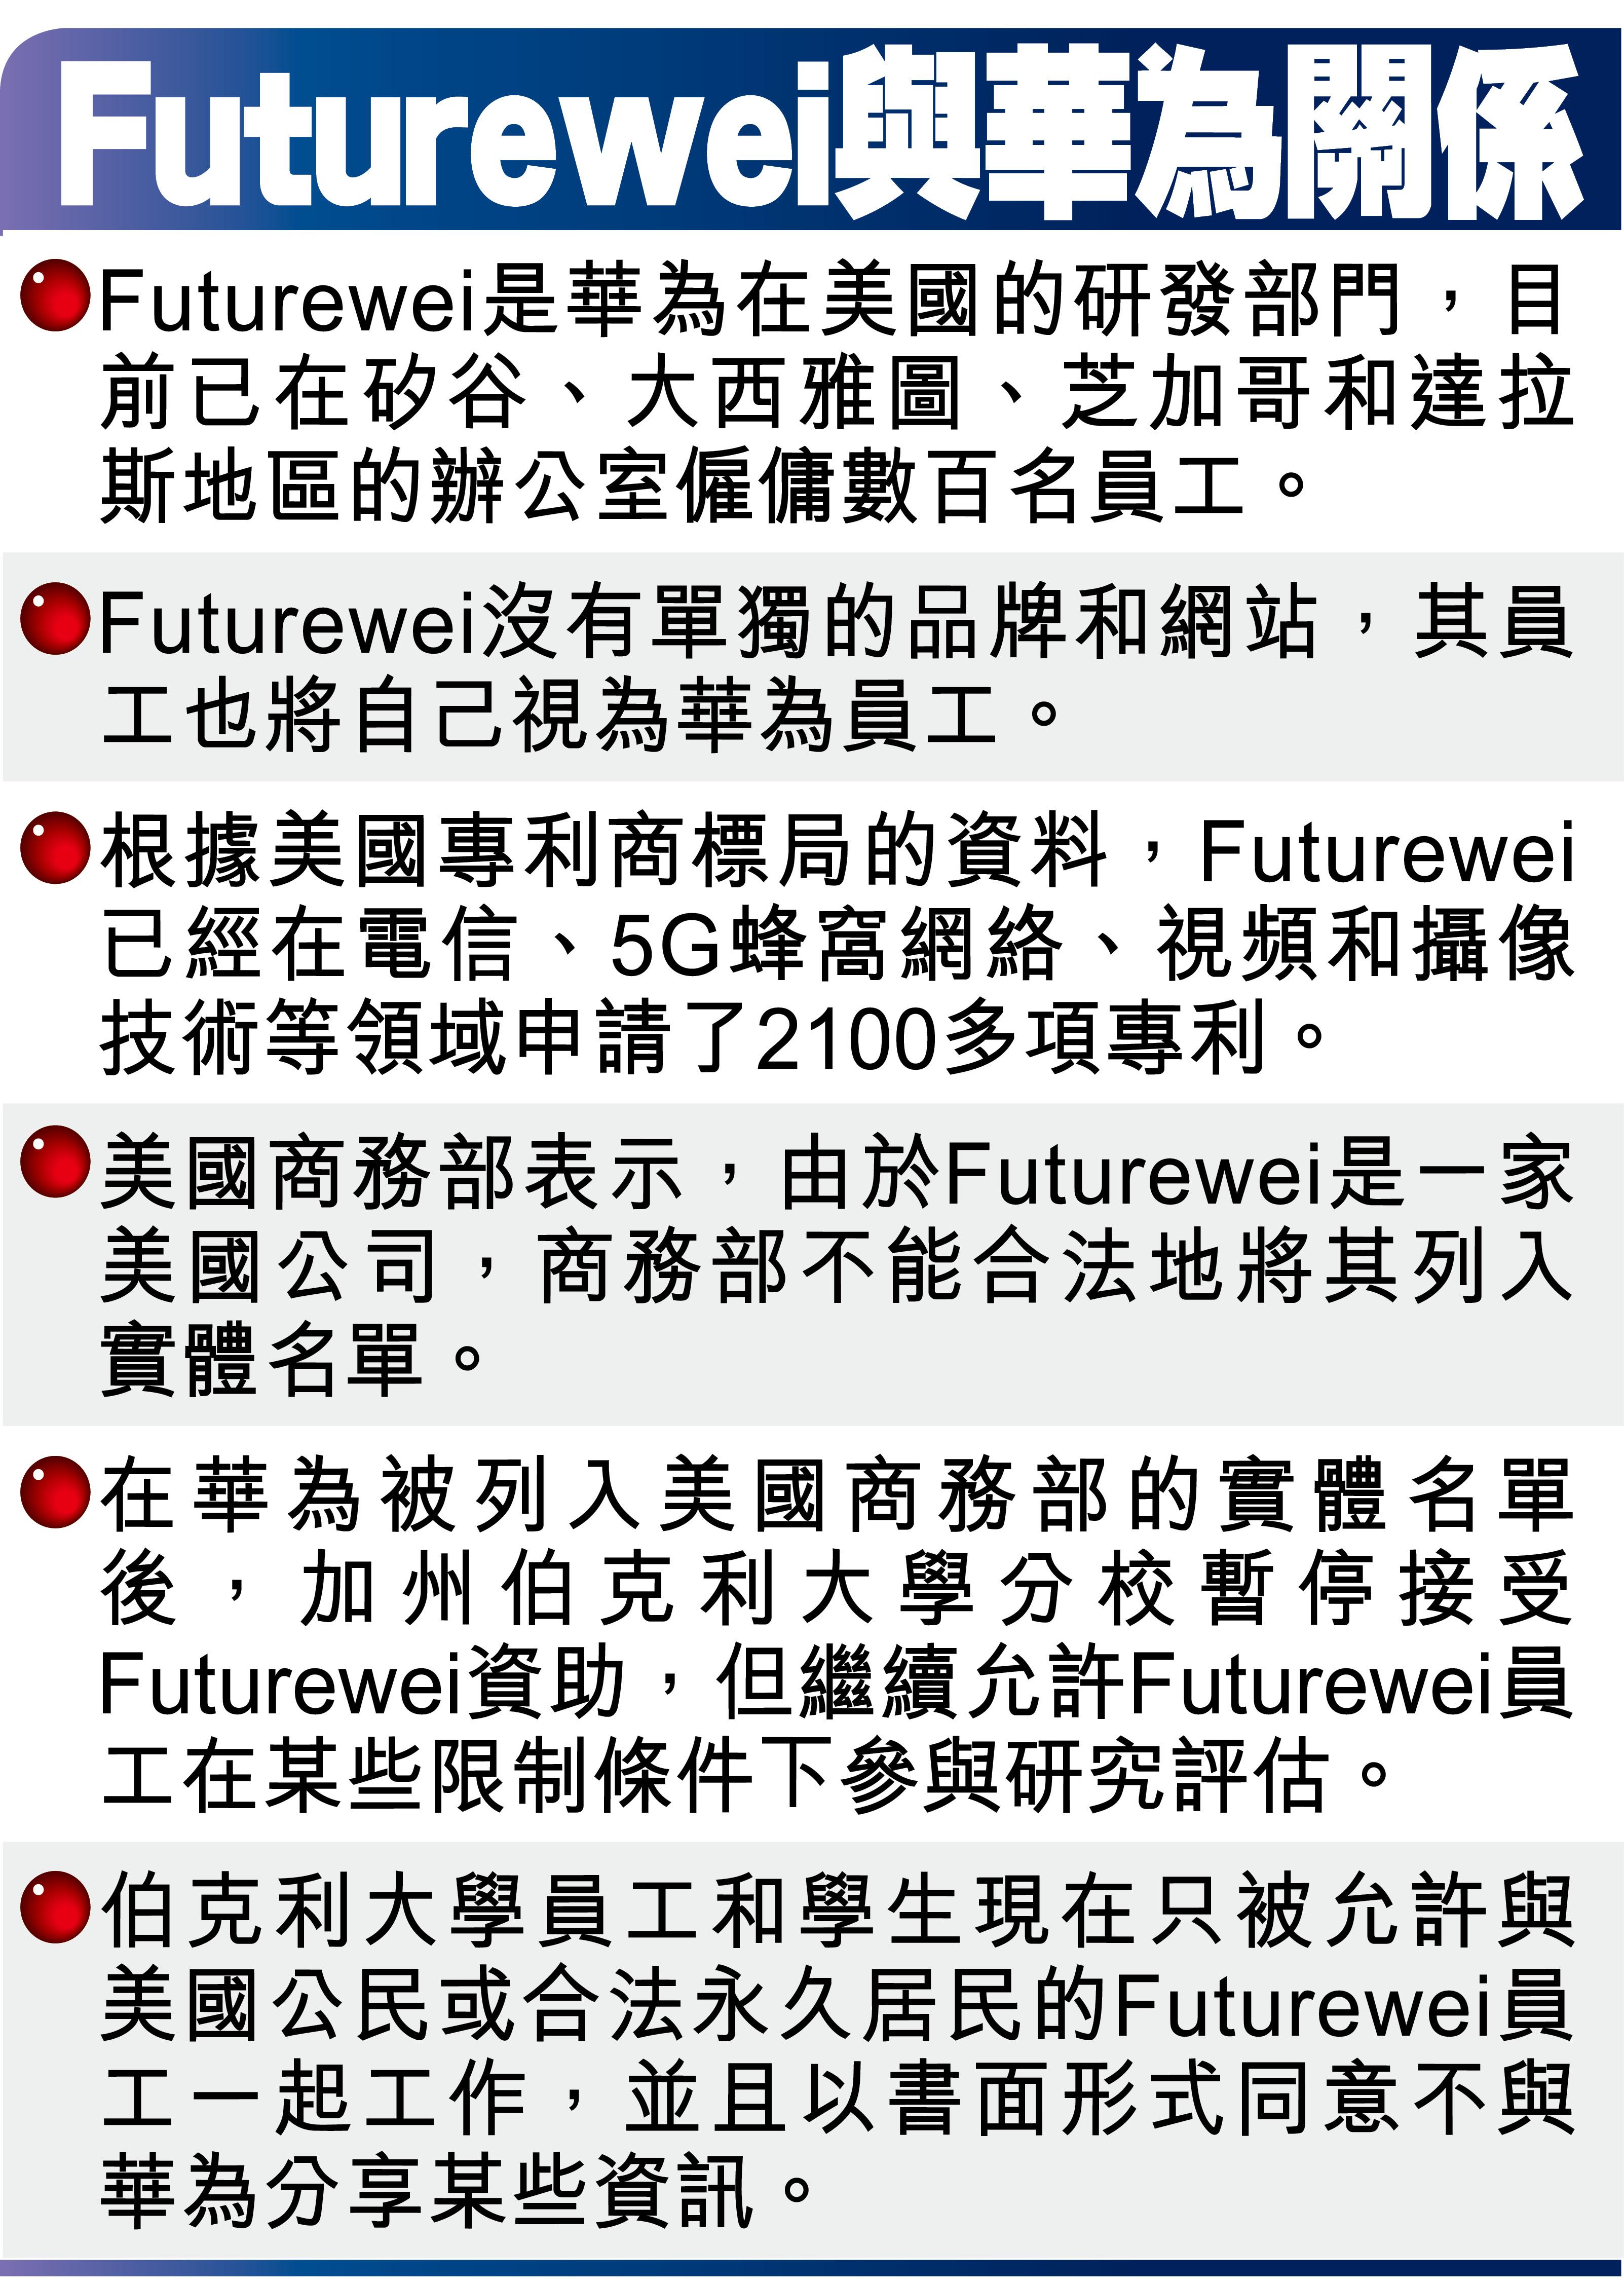 Futurewei與華為關係